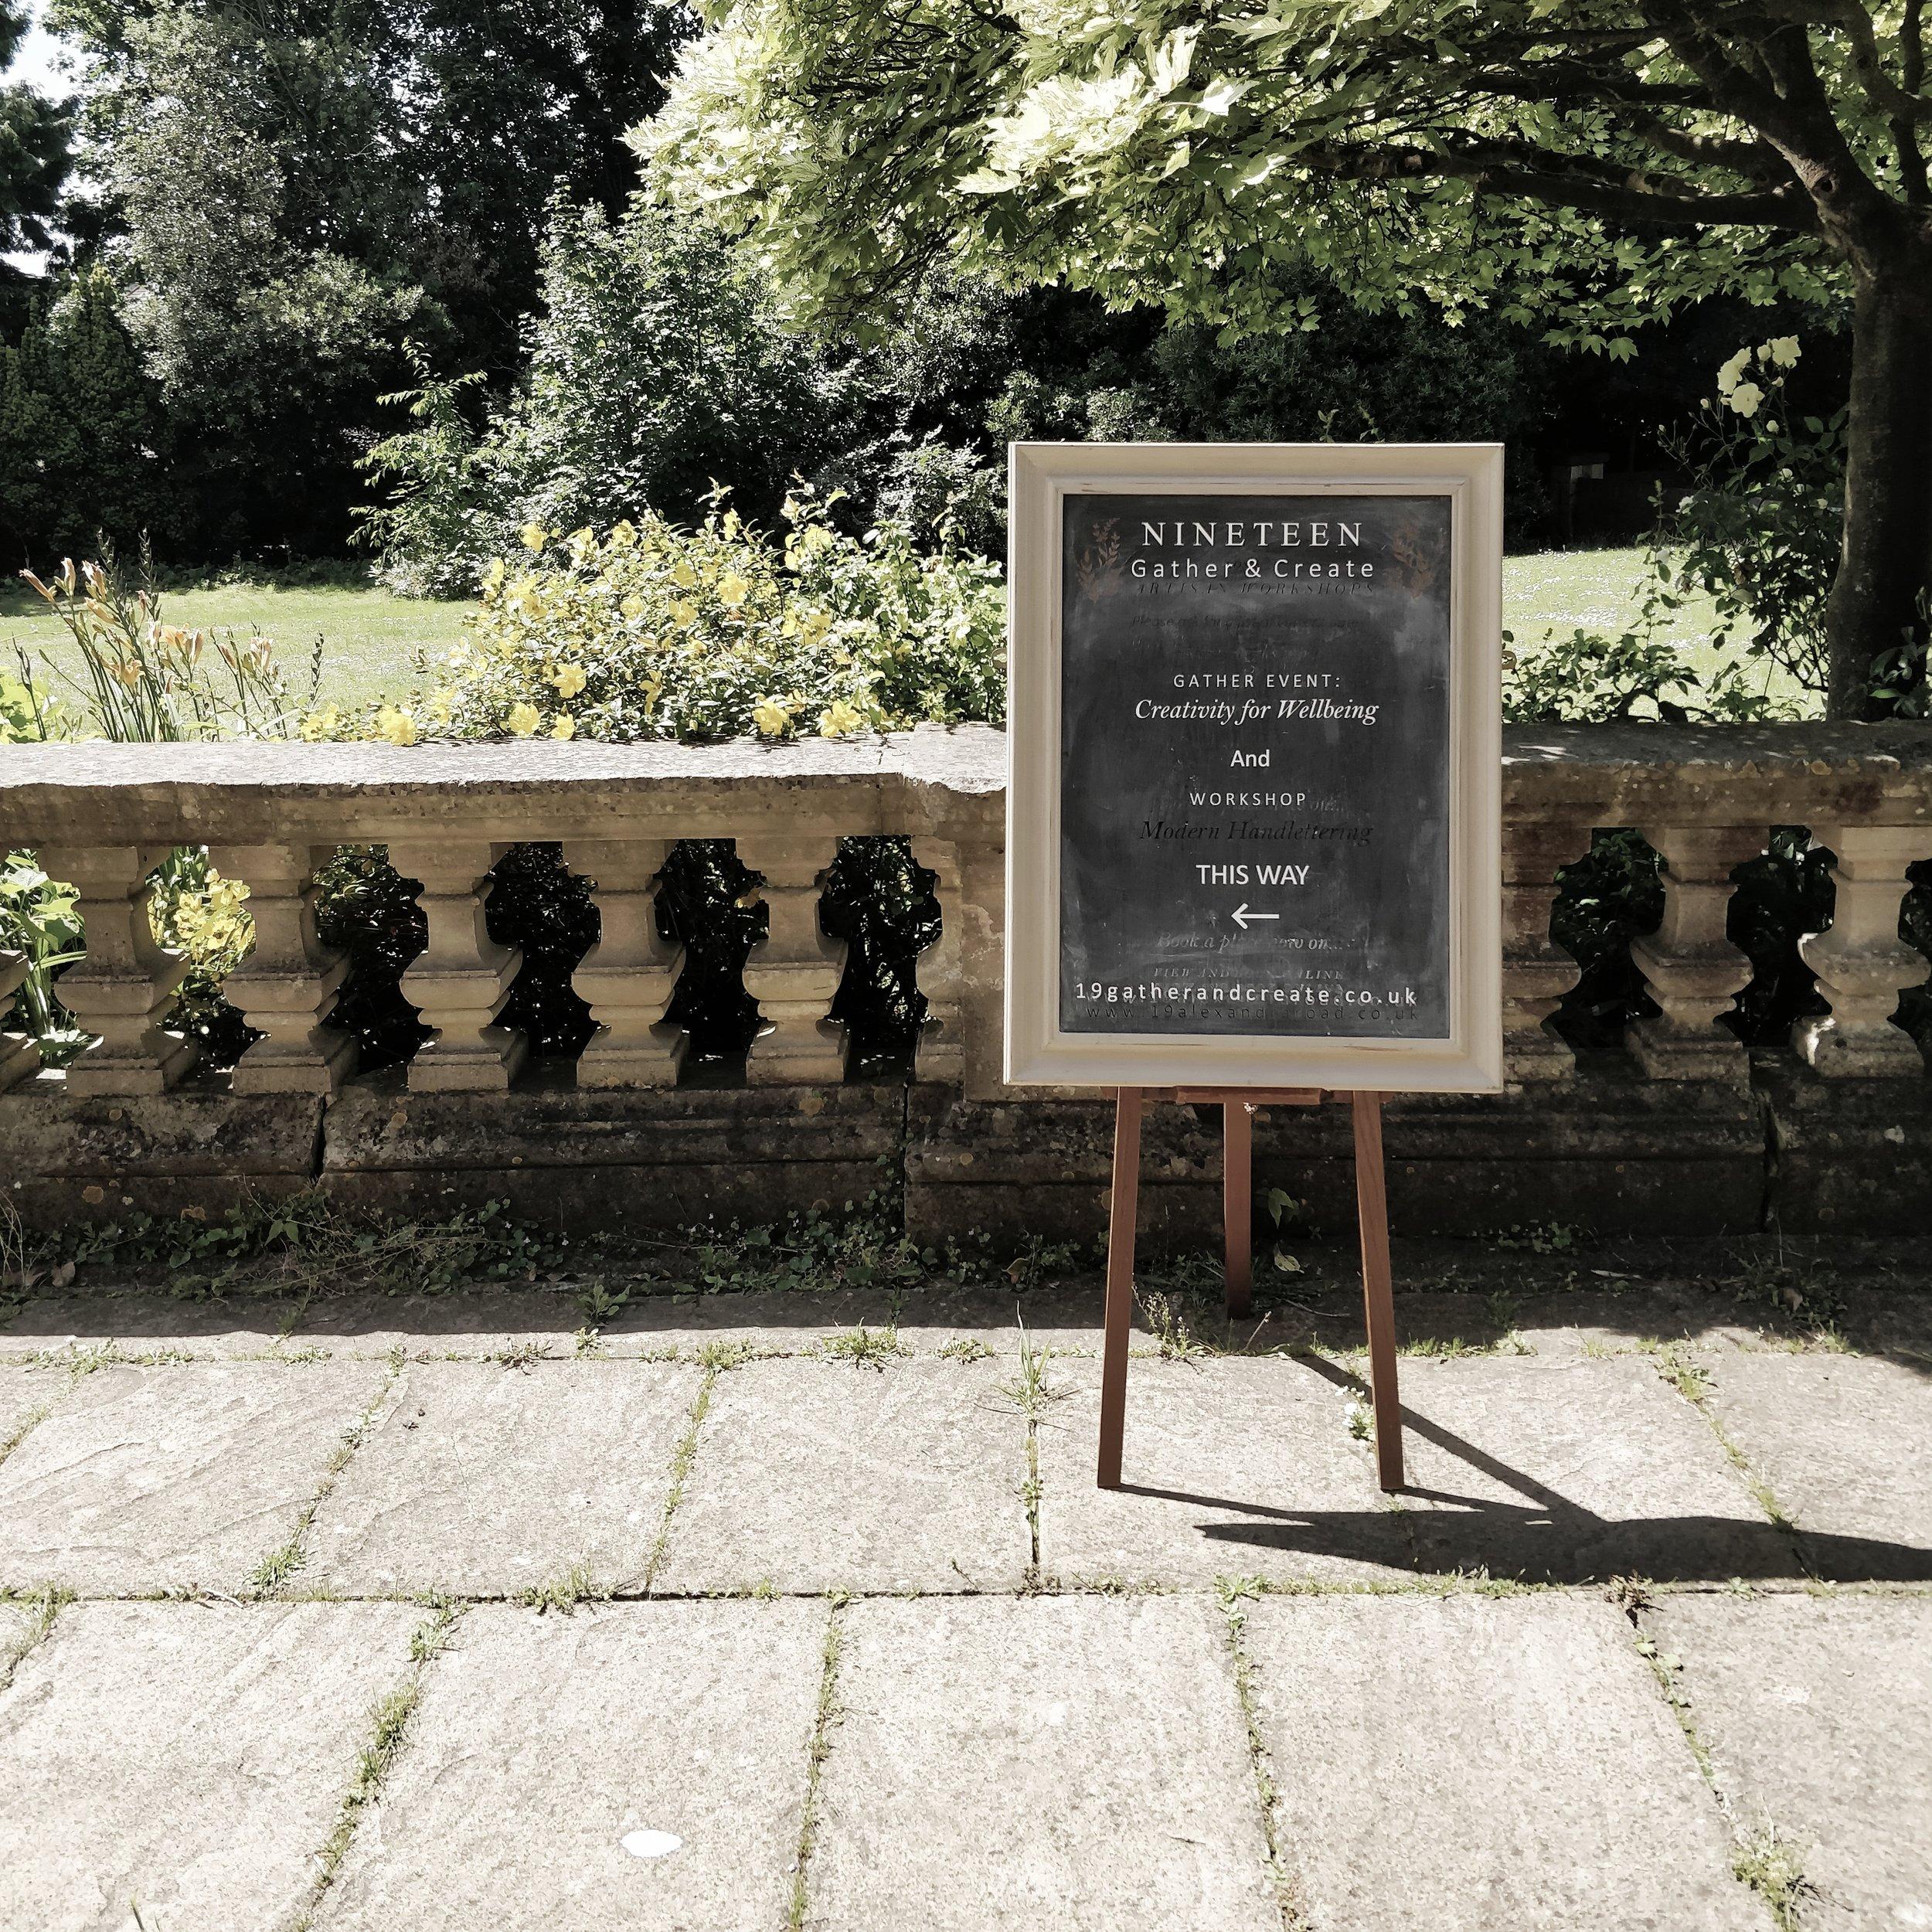 gather event chalk board.jpg